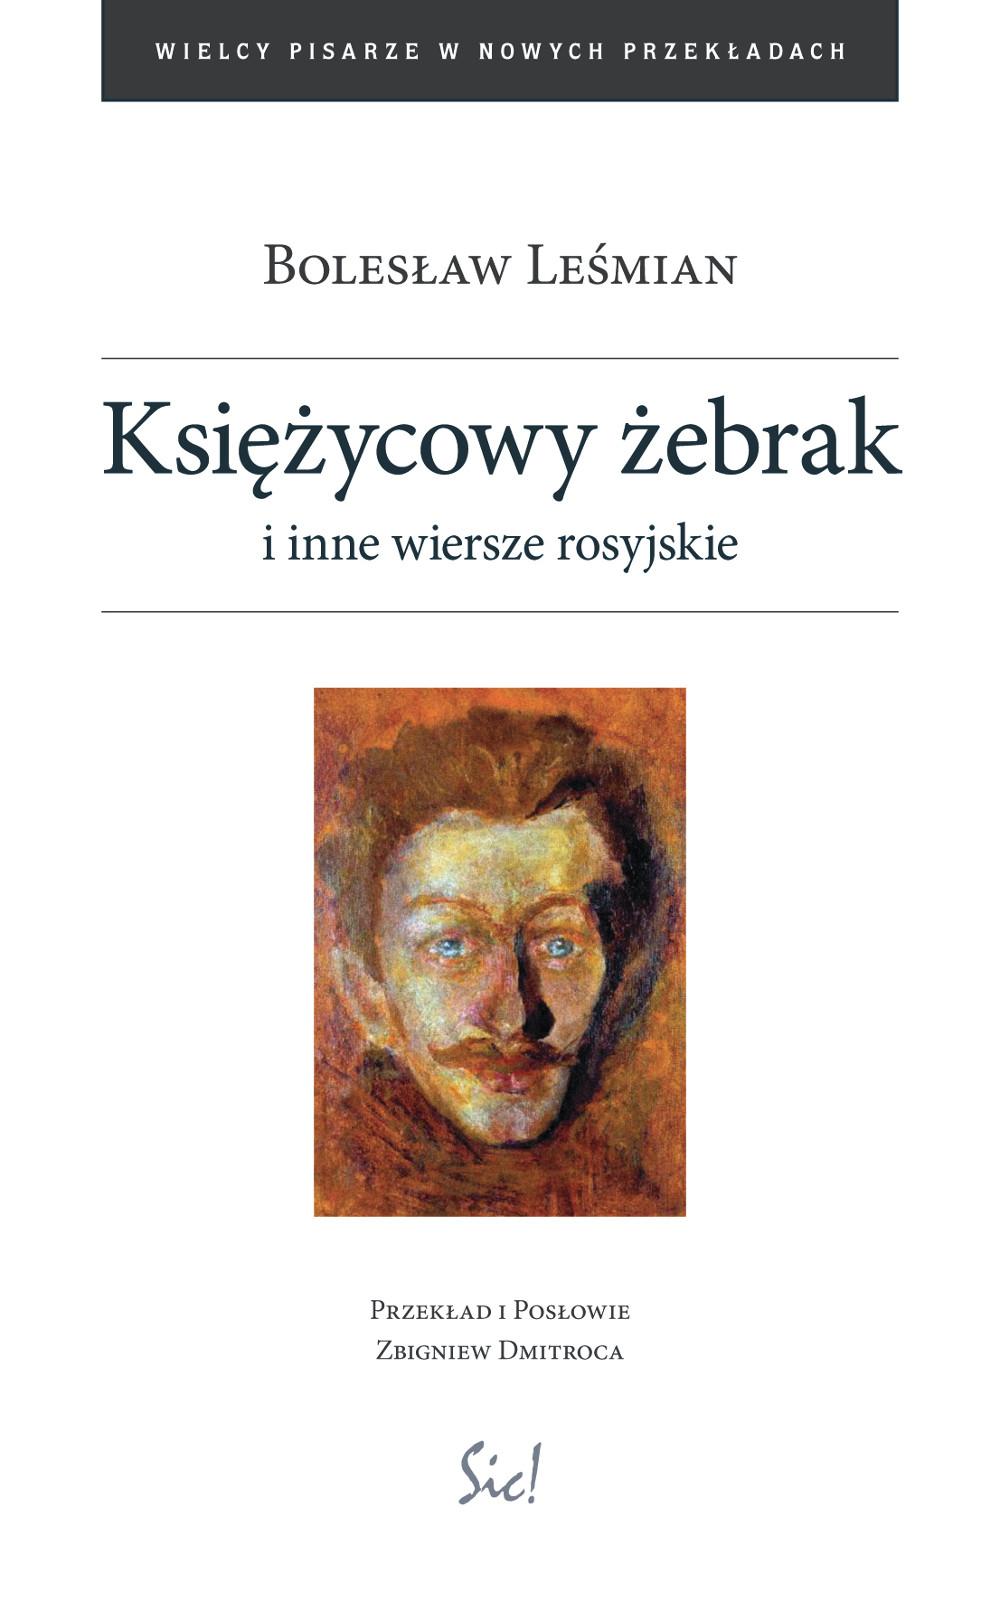 boleslaw-lesmian-ksiezycowy-zebrak-okladka